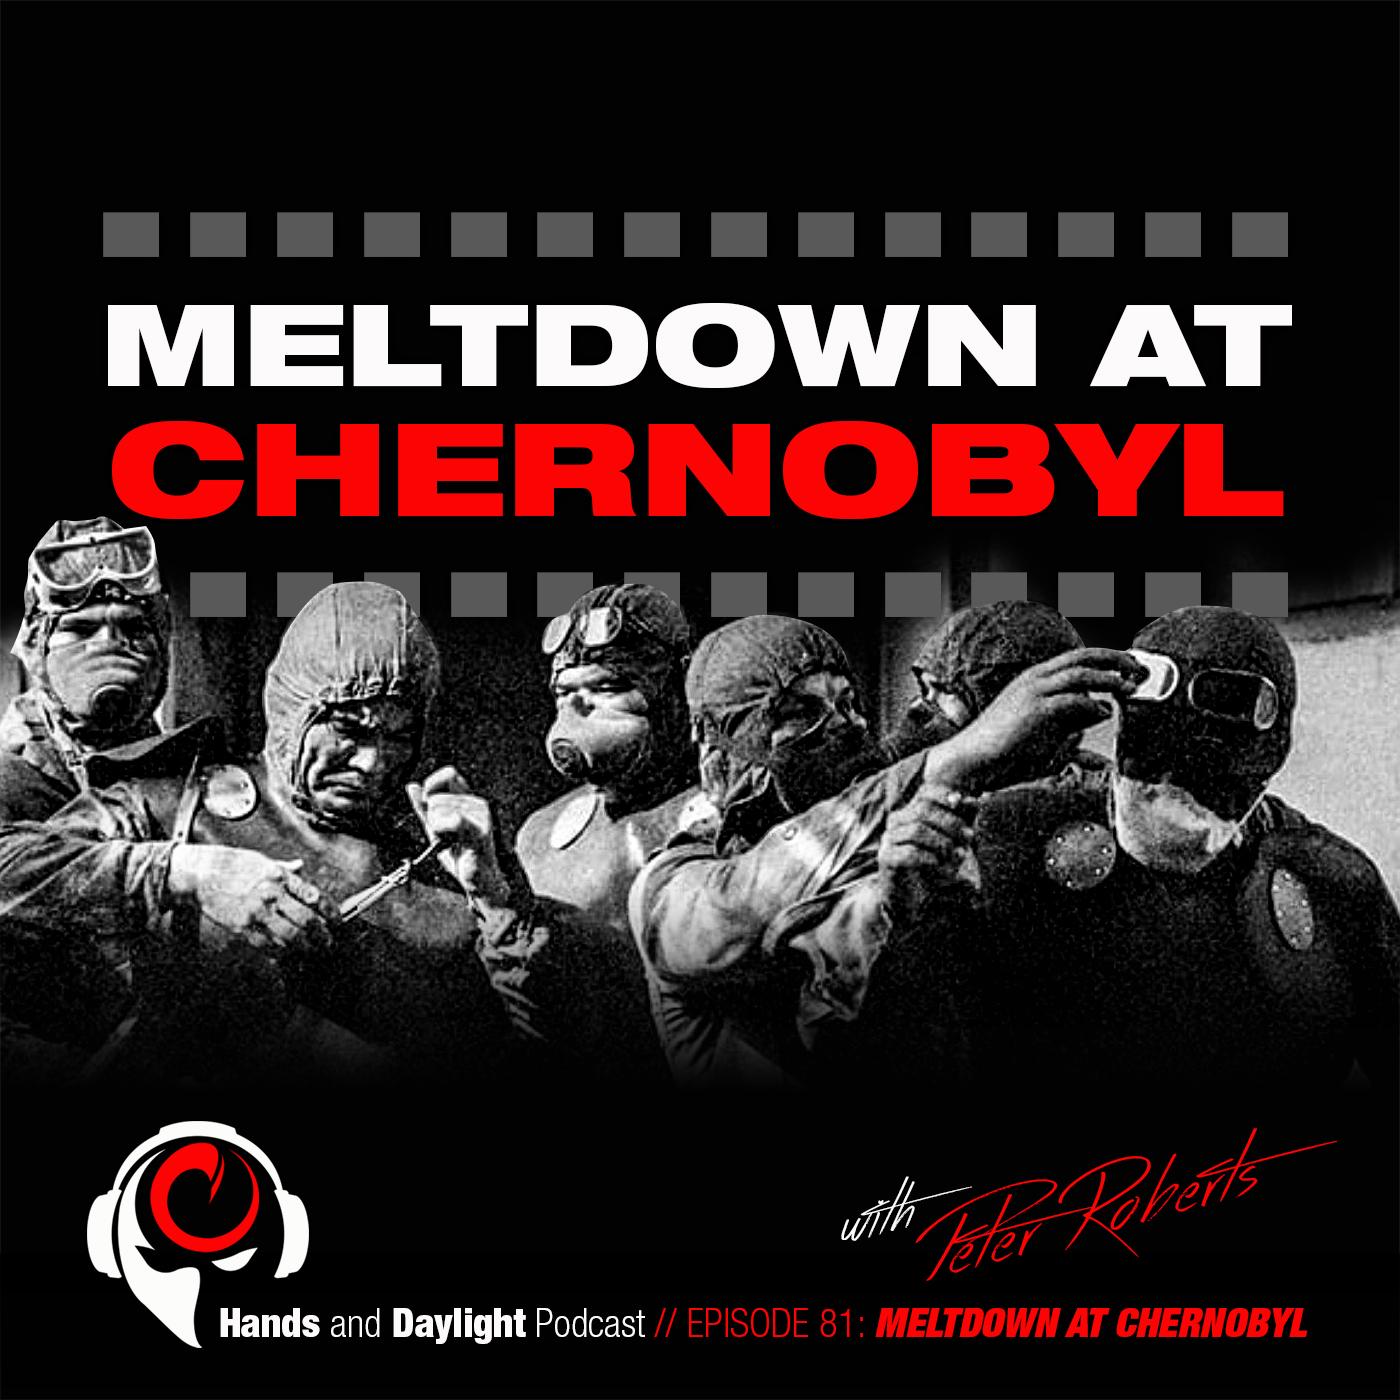 E81: MELTDOWN AT CHERNOBYL